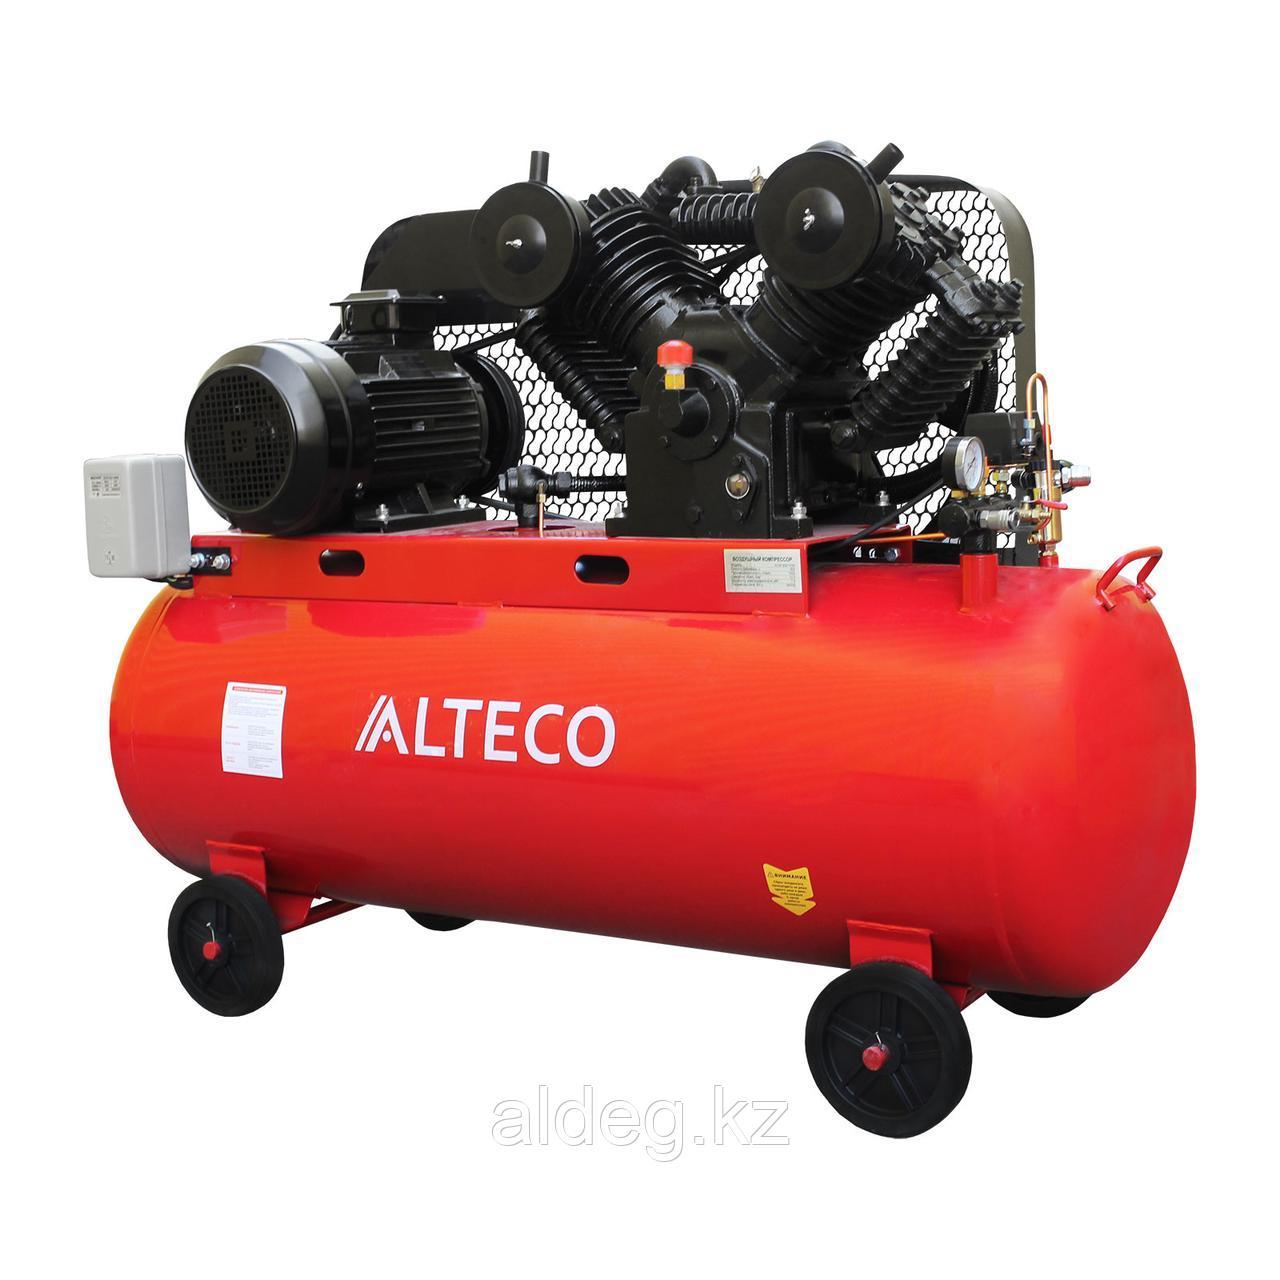 Компрессор ACB-300/1100 ALTECO Standard